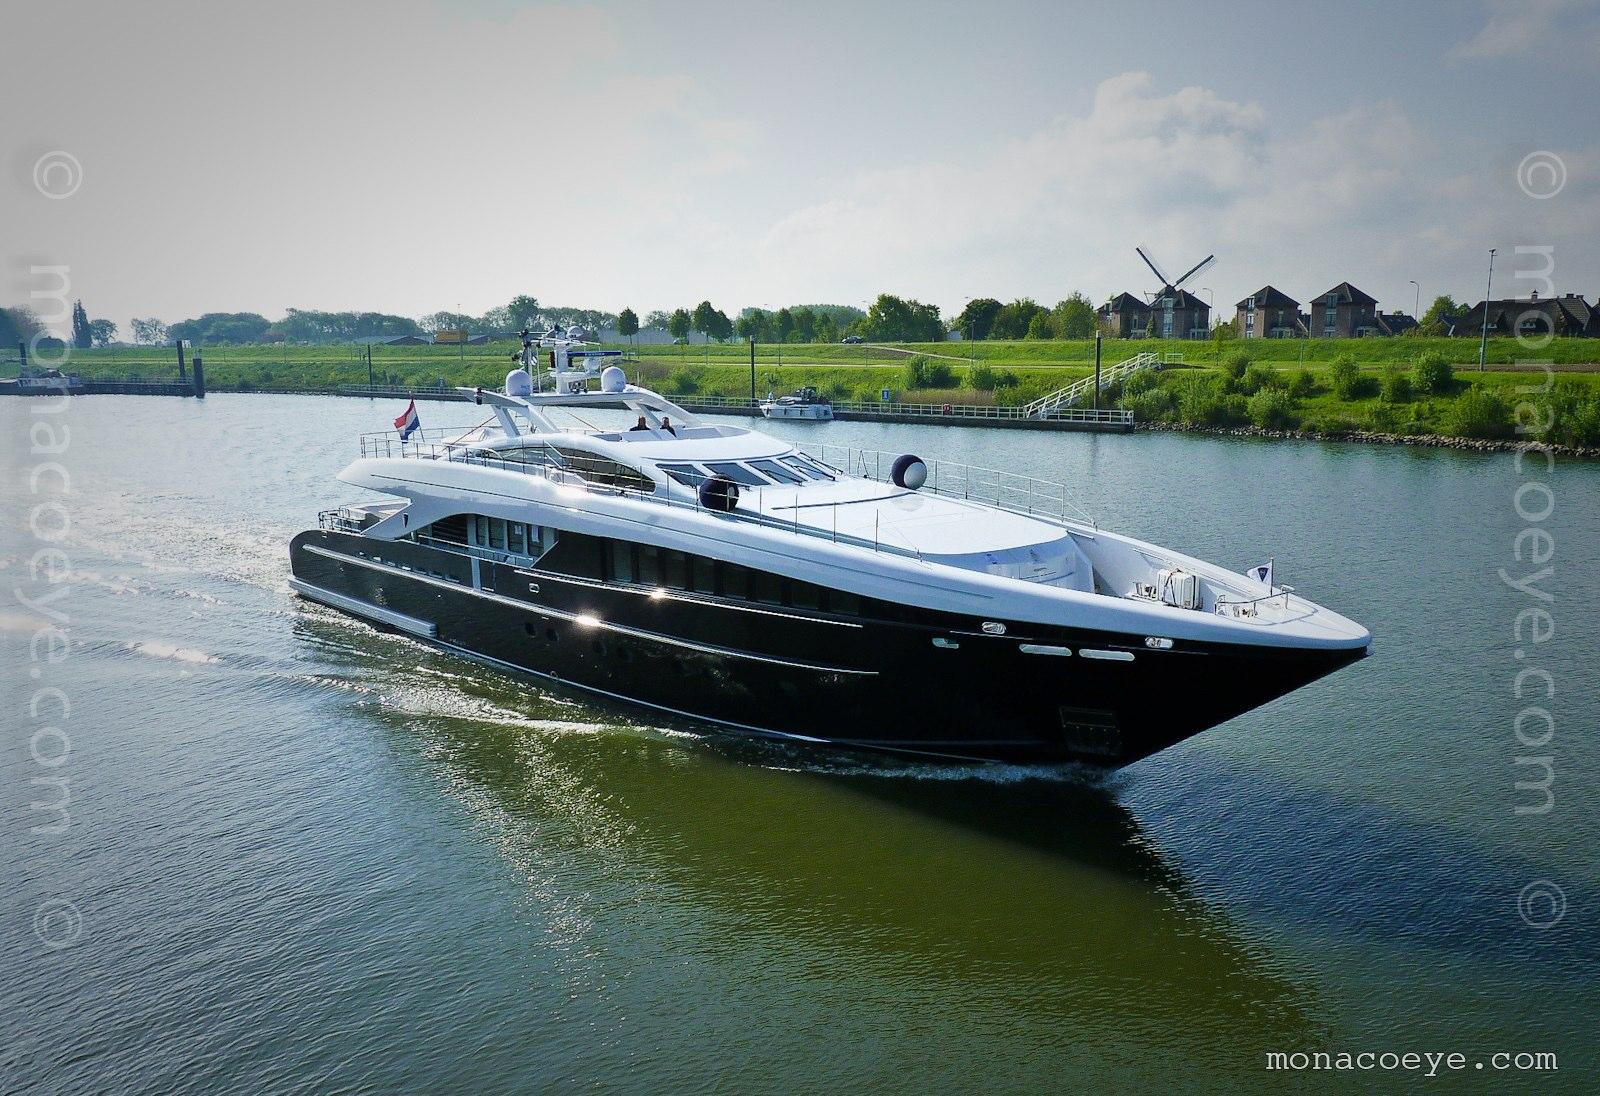 Willpower, new yacht from Heesen. Build number 14537, 2009, 37 metres